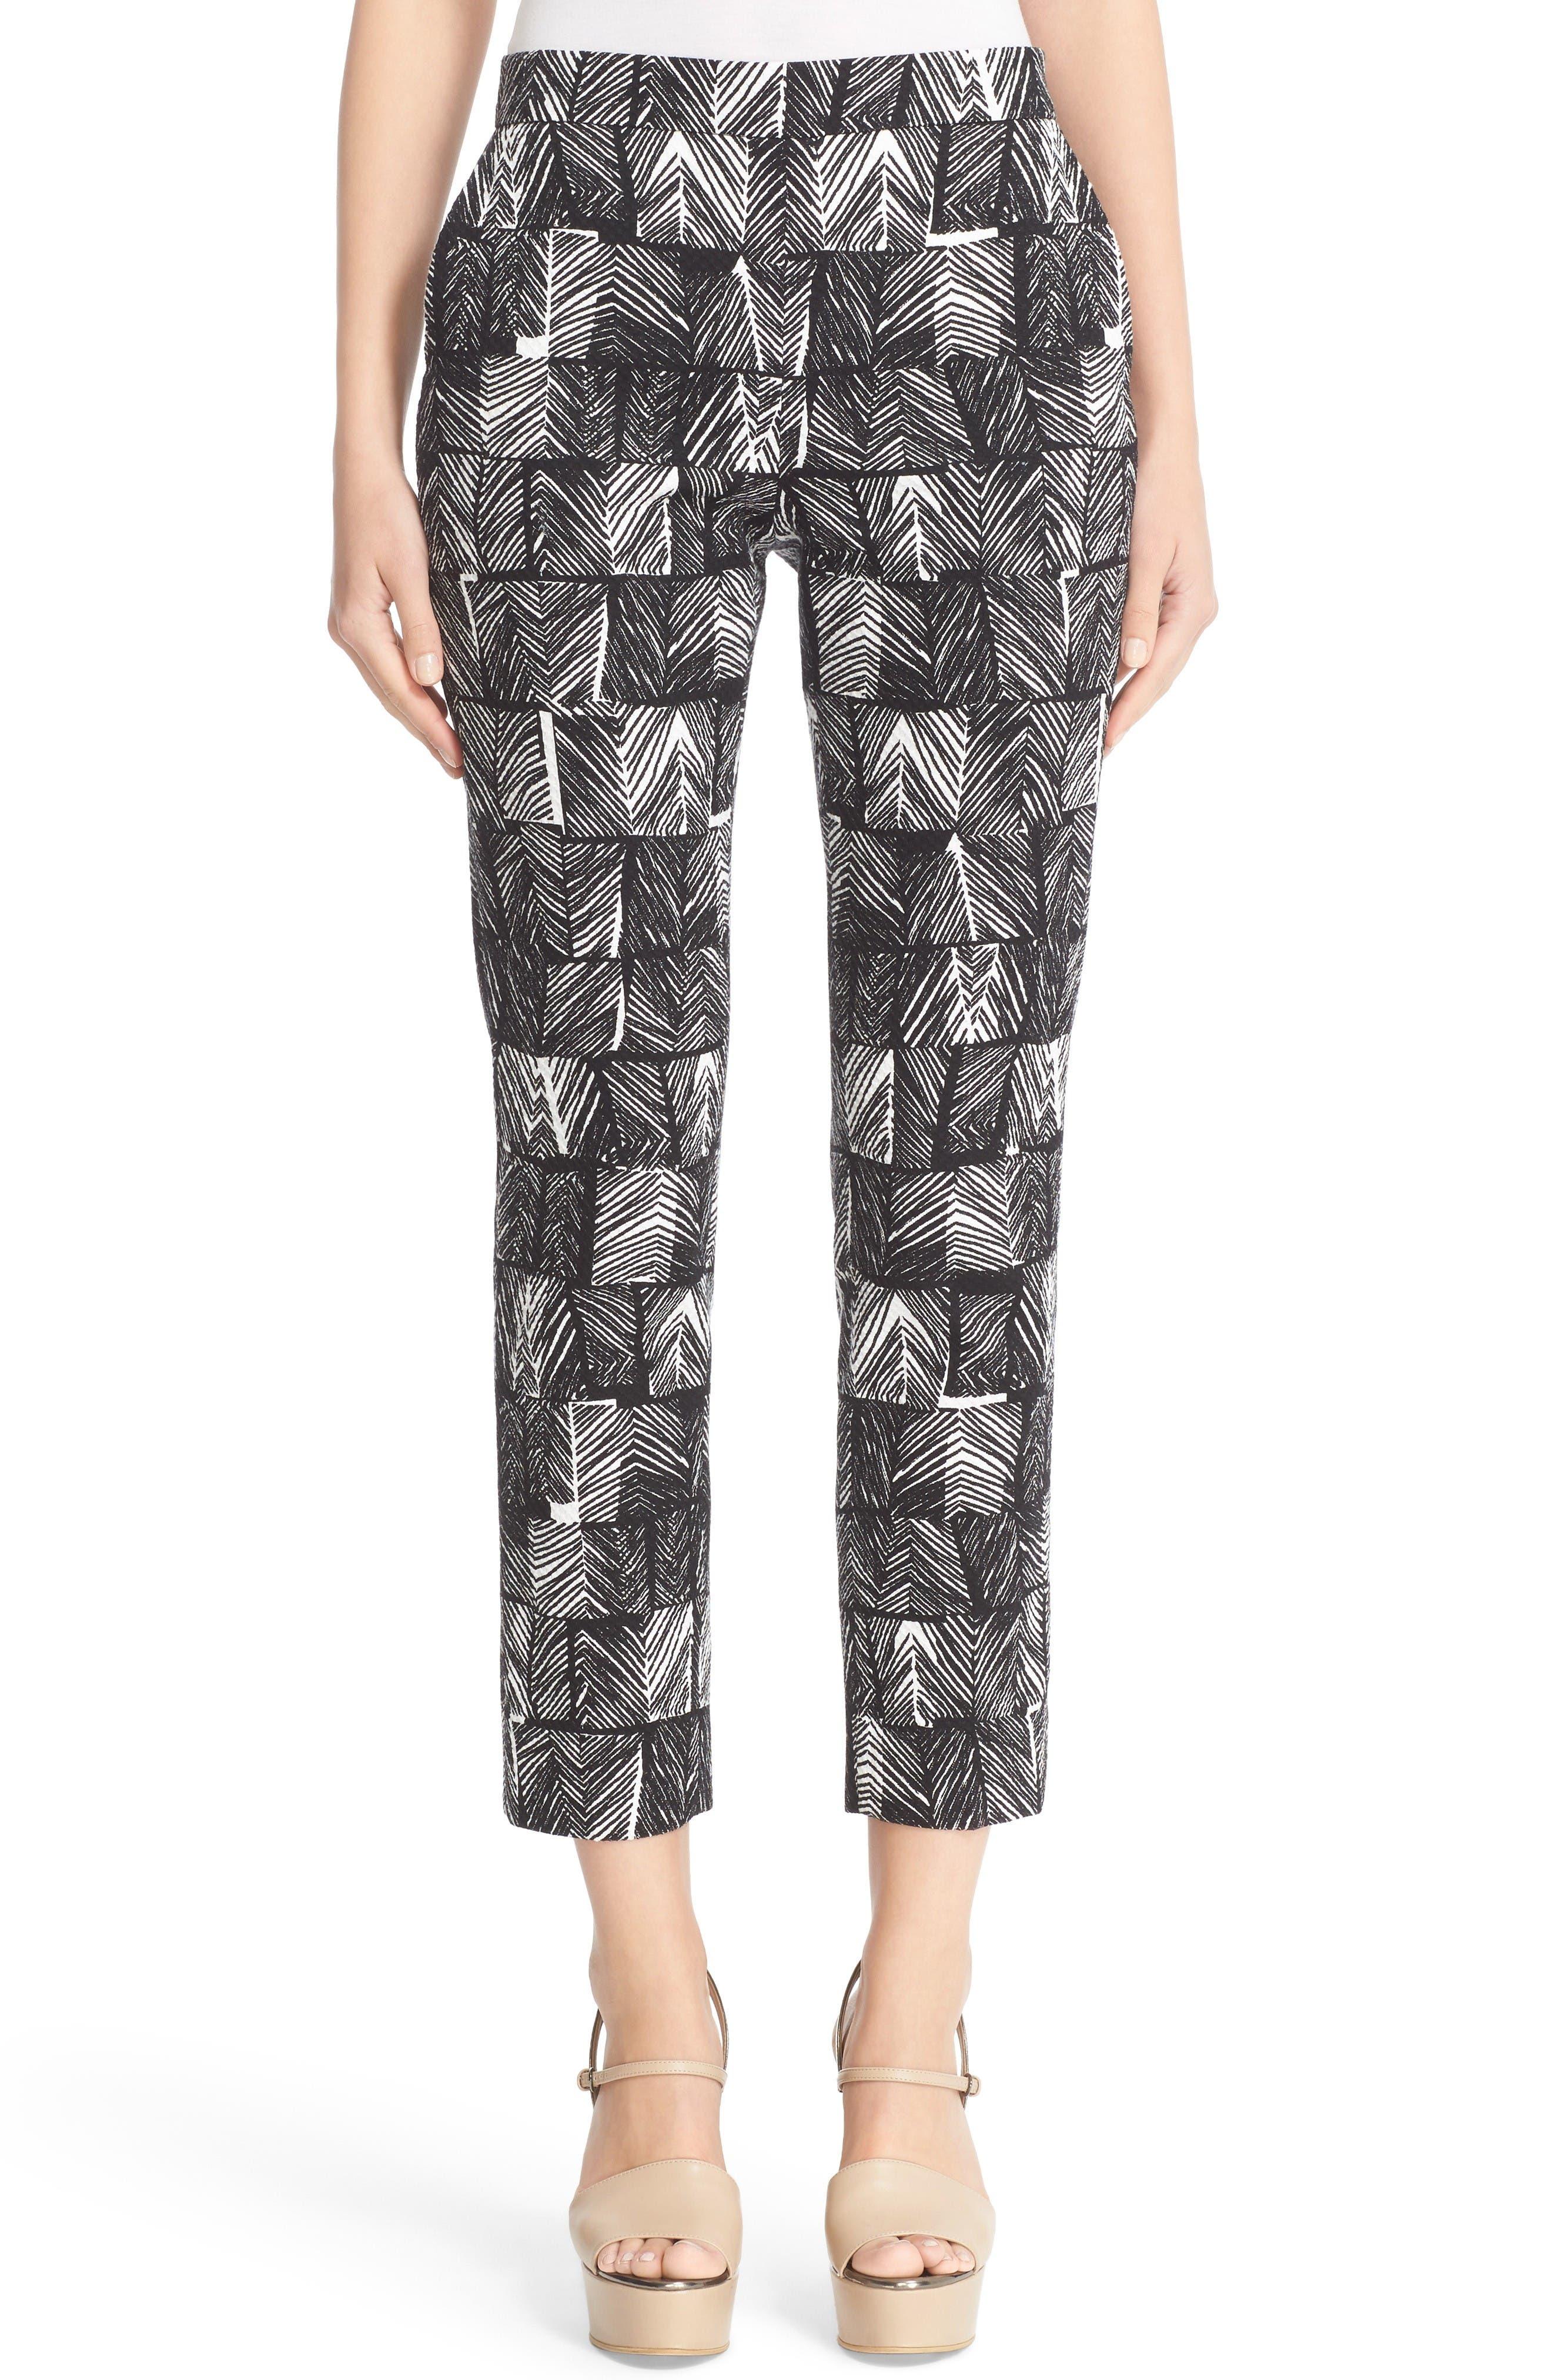 MAX MARA Paggio Graphic Print Crop Pants